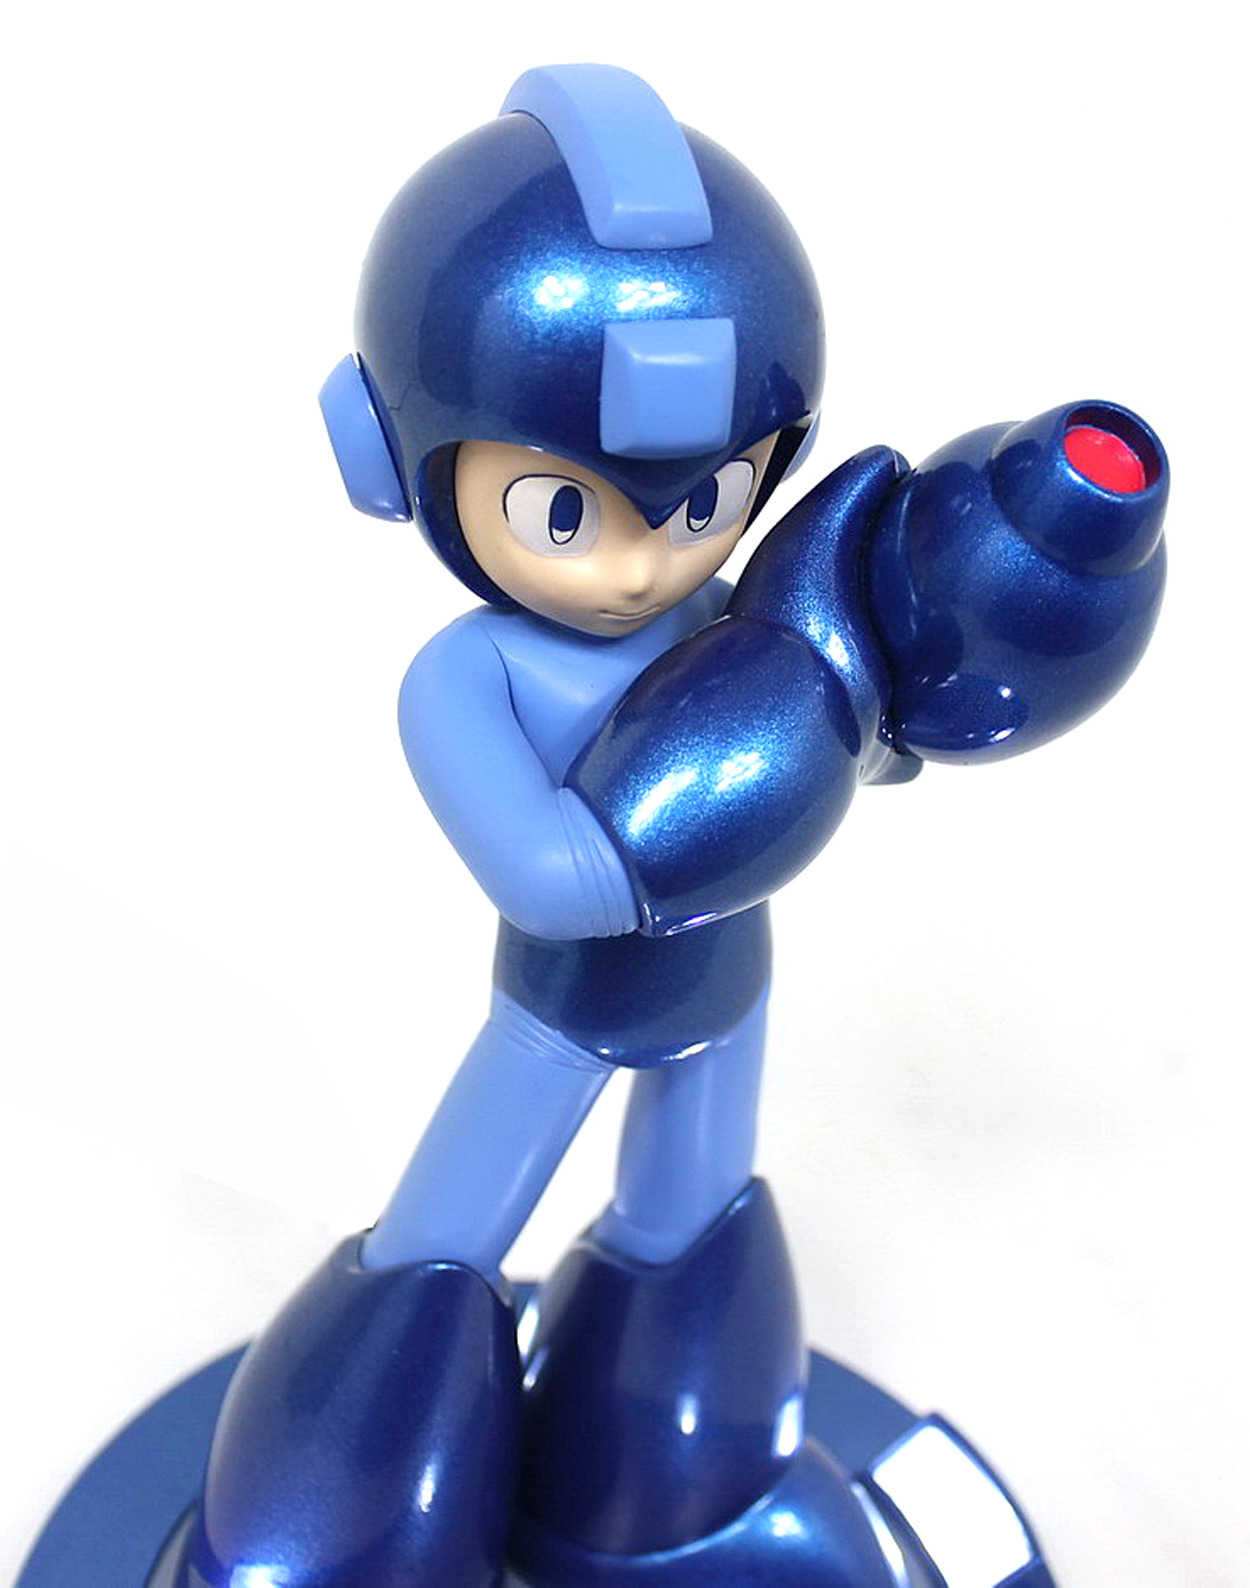 25th anniversary Mega Man statue 25-04-13-003